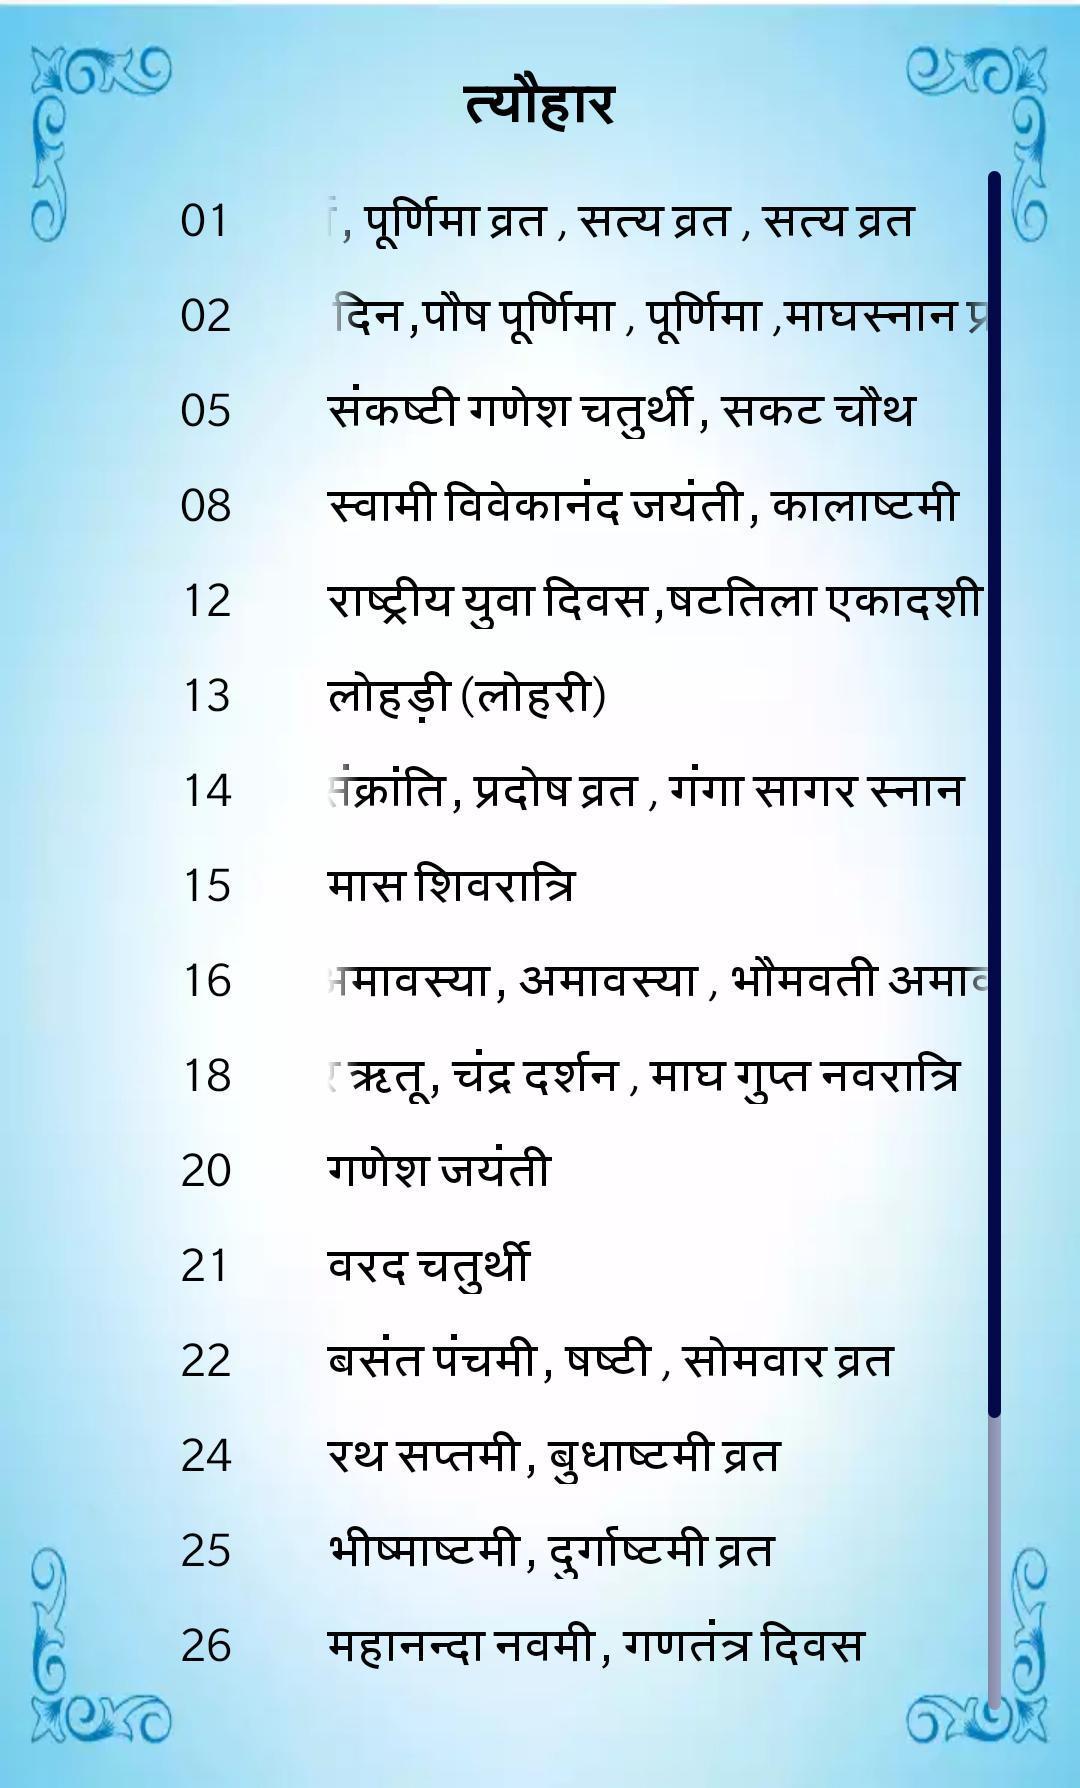 Hindi Calendar 2018 - 2020 Для Андроид - Скачать Apk